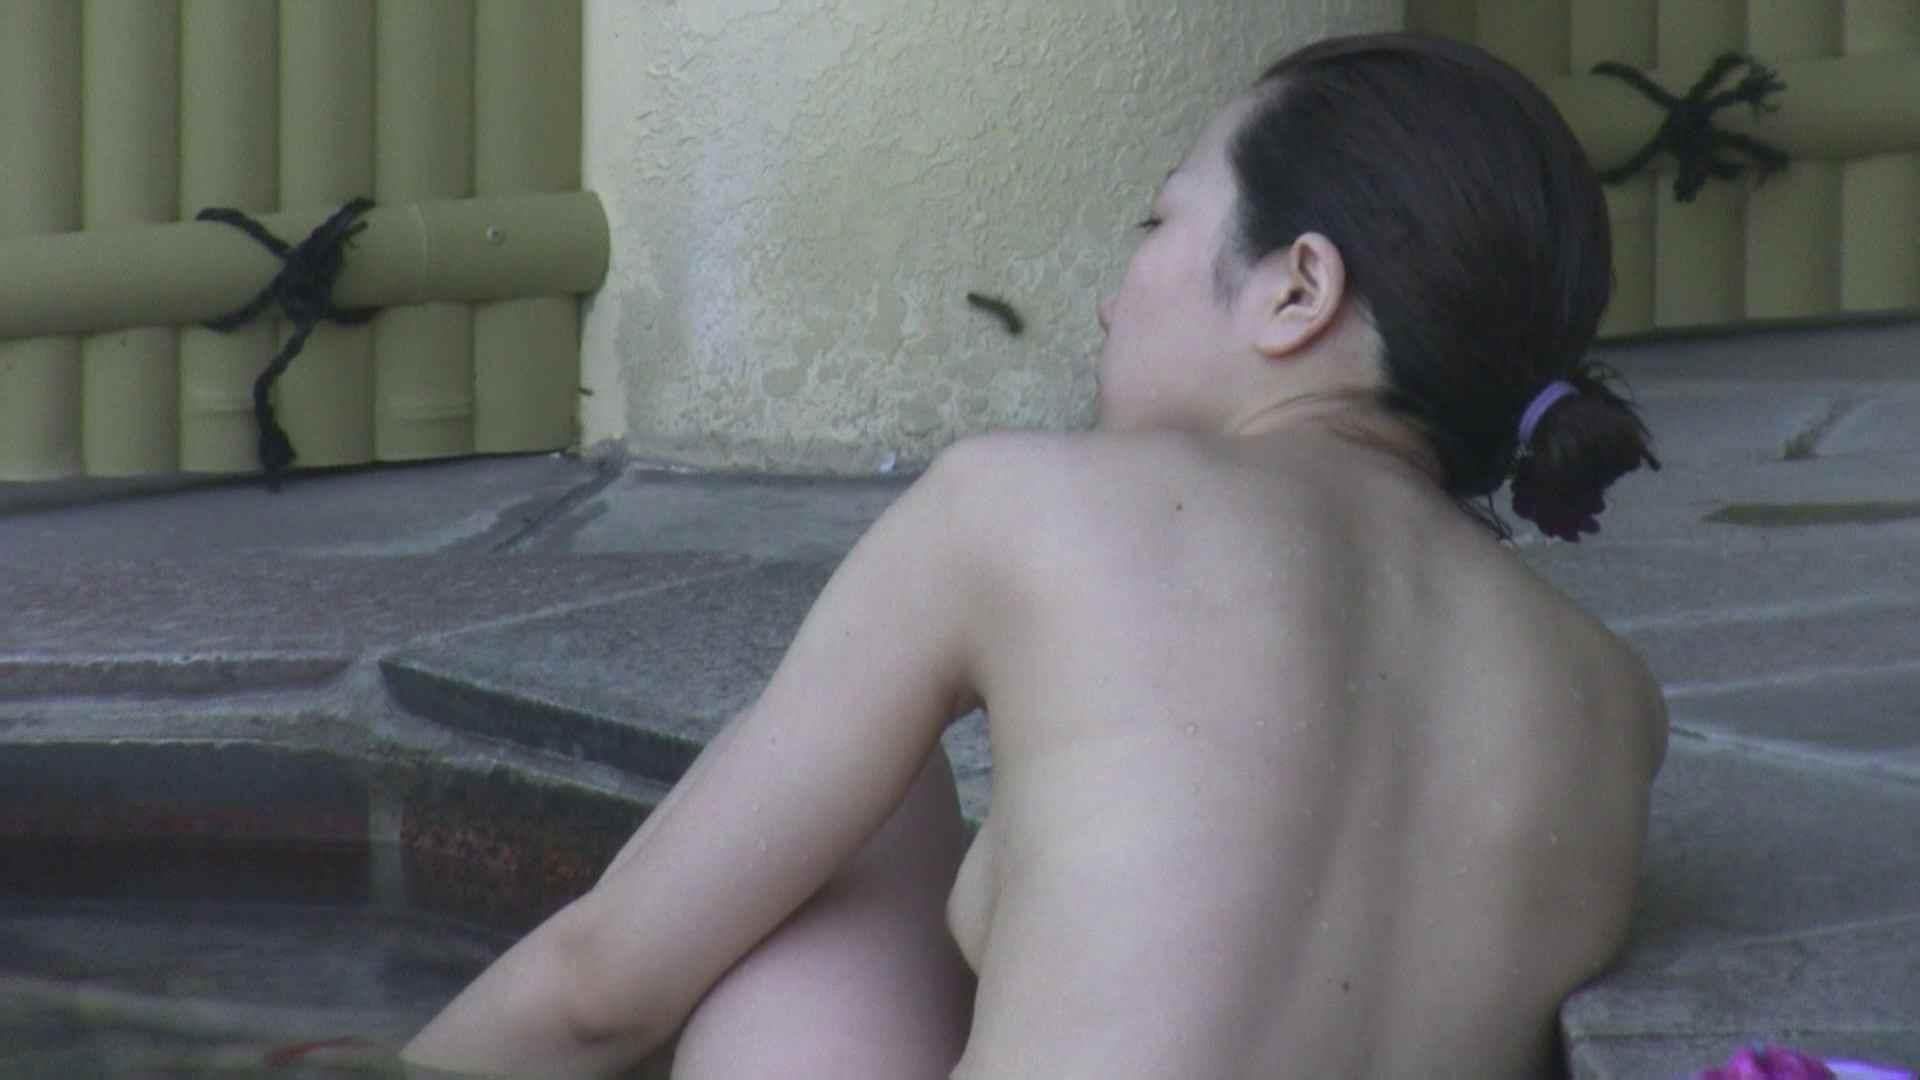 Aquaな露天風呂Vol.88【VIP限定】 盗撮 オマンコ無修正動画無料 61連発 56